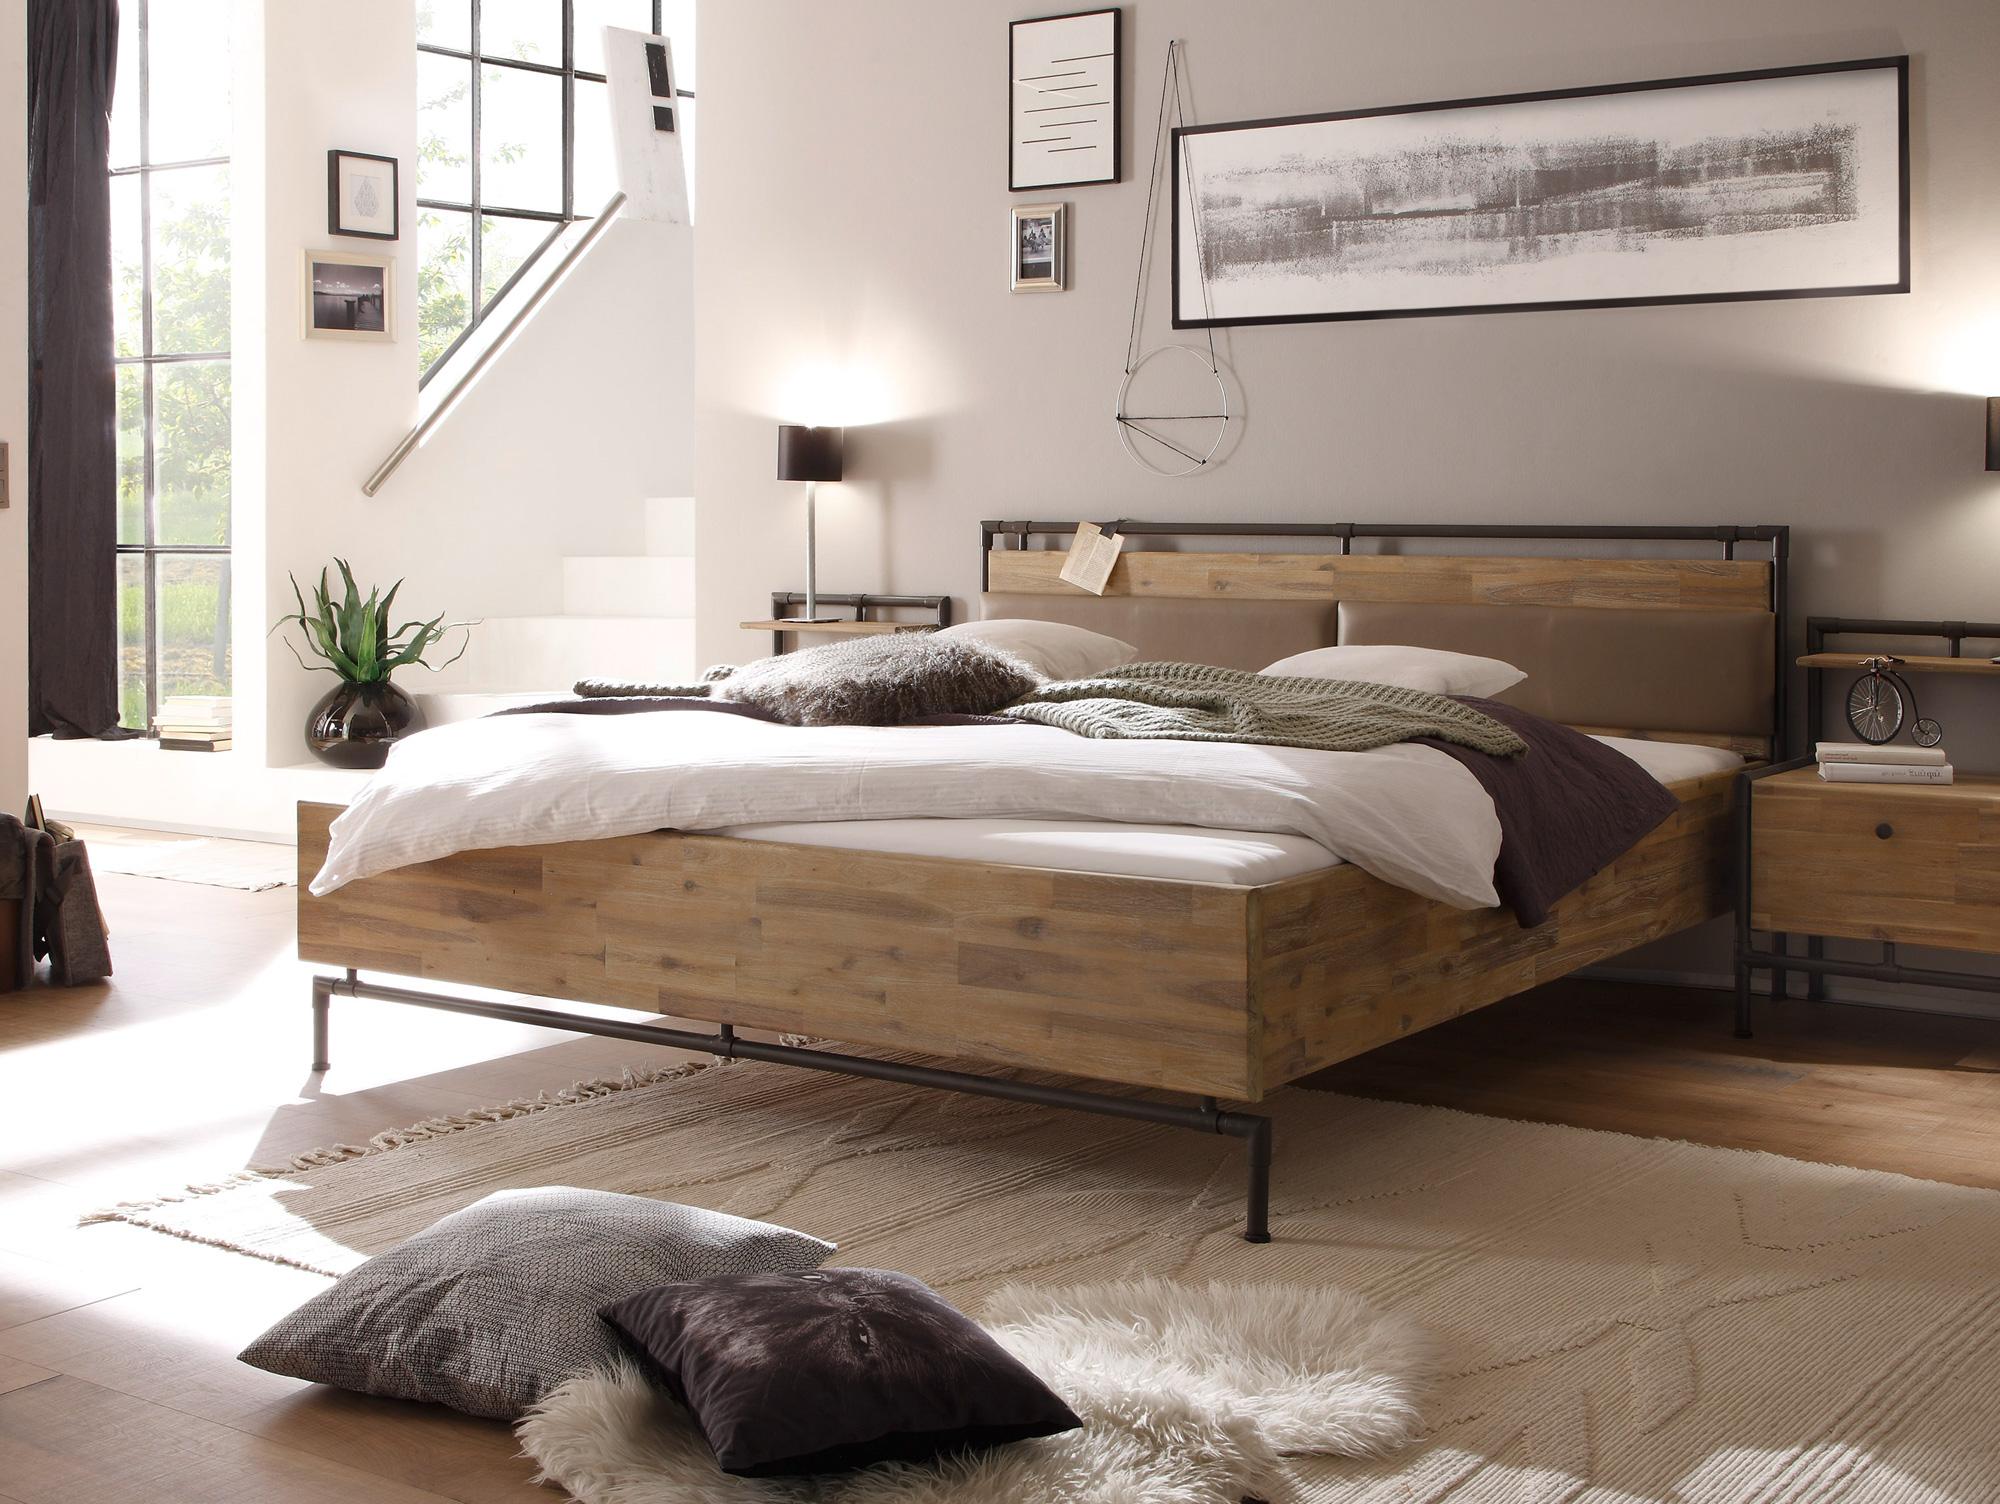 terry doppelbett 180x200 cm akazie geb rstet. Black Bedroom Furniture Sets. Home Design Ideas